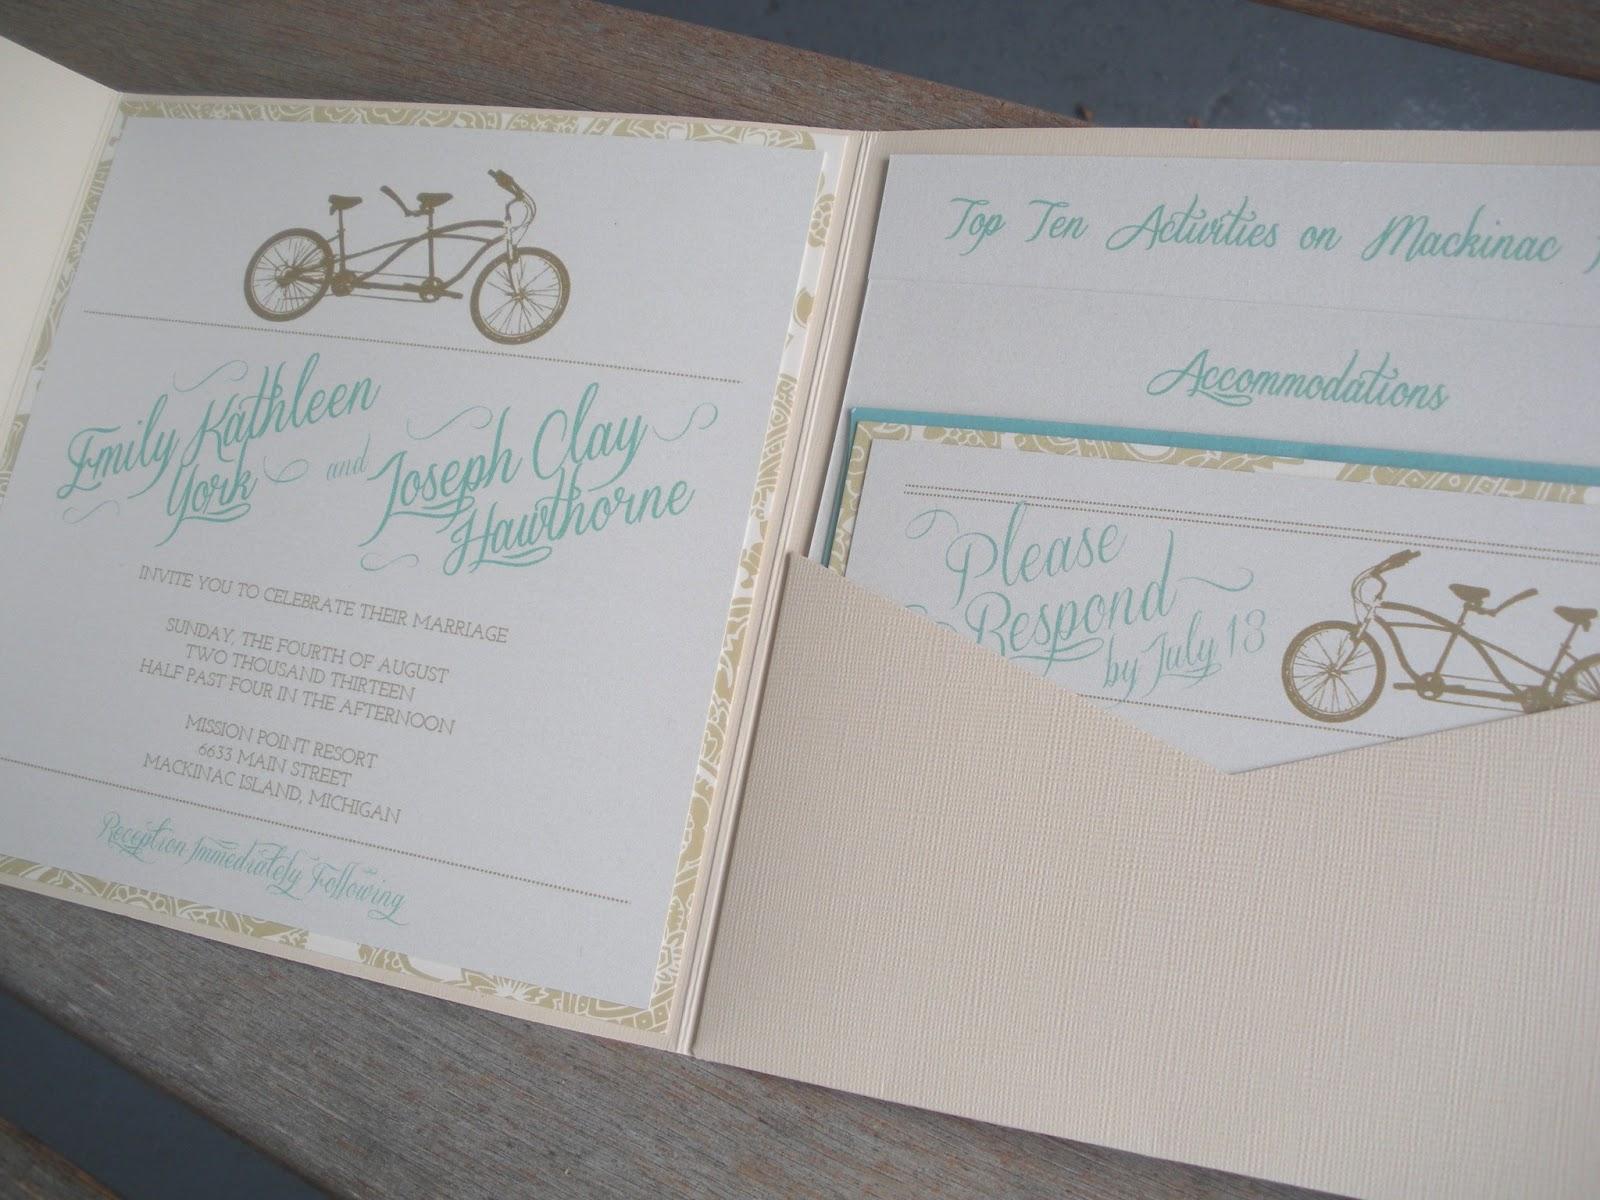 Vivian elle invitations emily and josephs mackinac island wedding emily and josephs mackinac island wedding invitations stopboris Choice Image